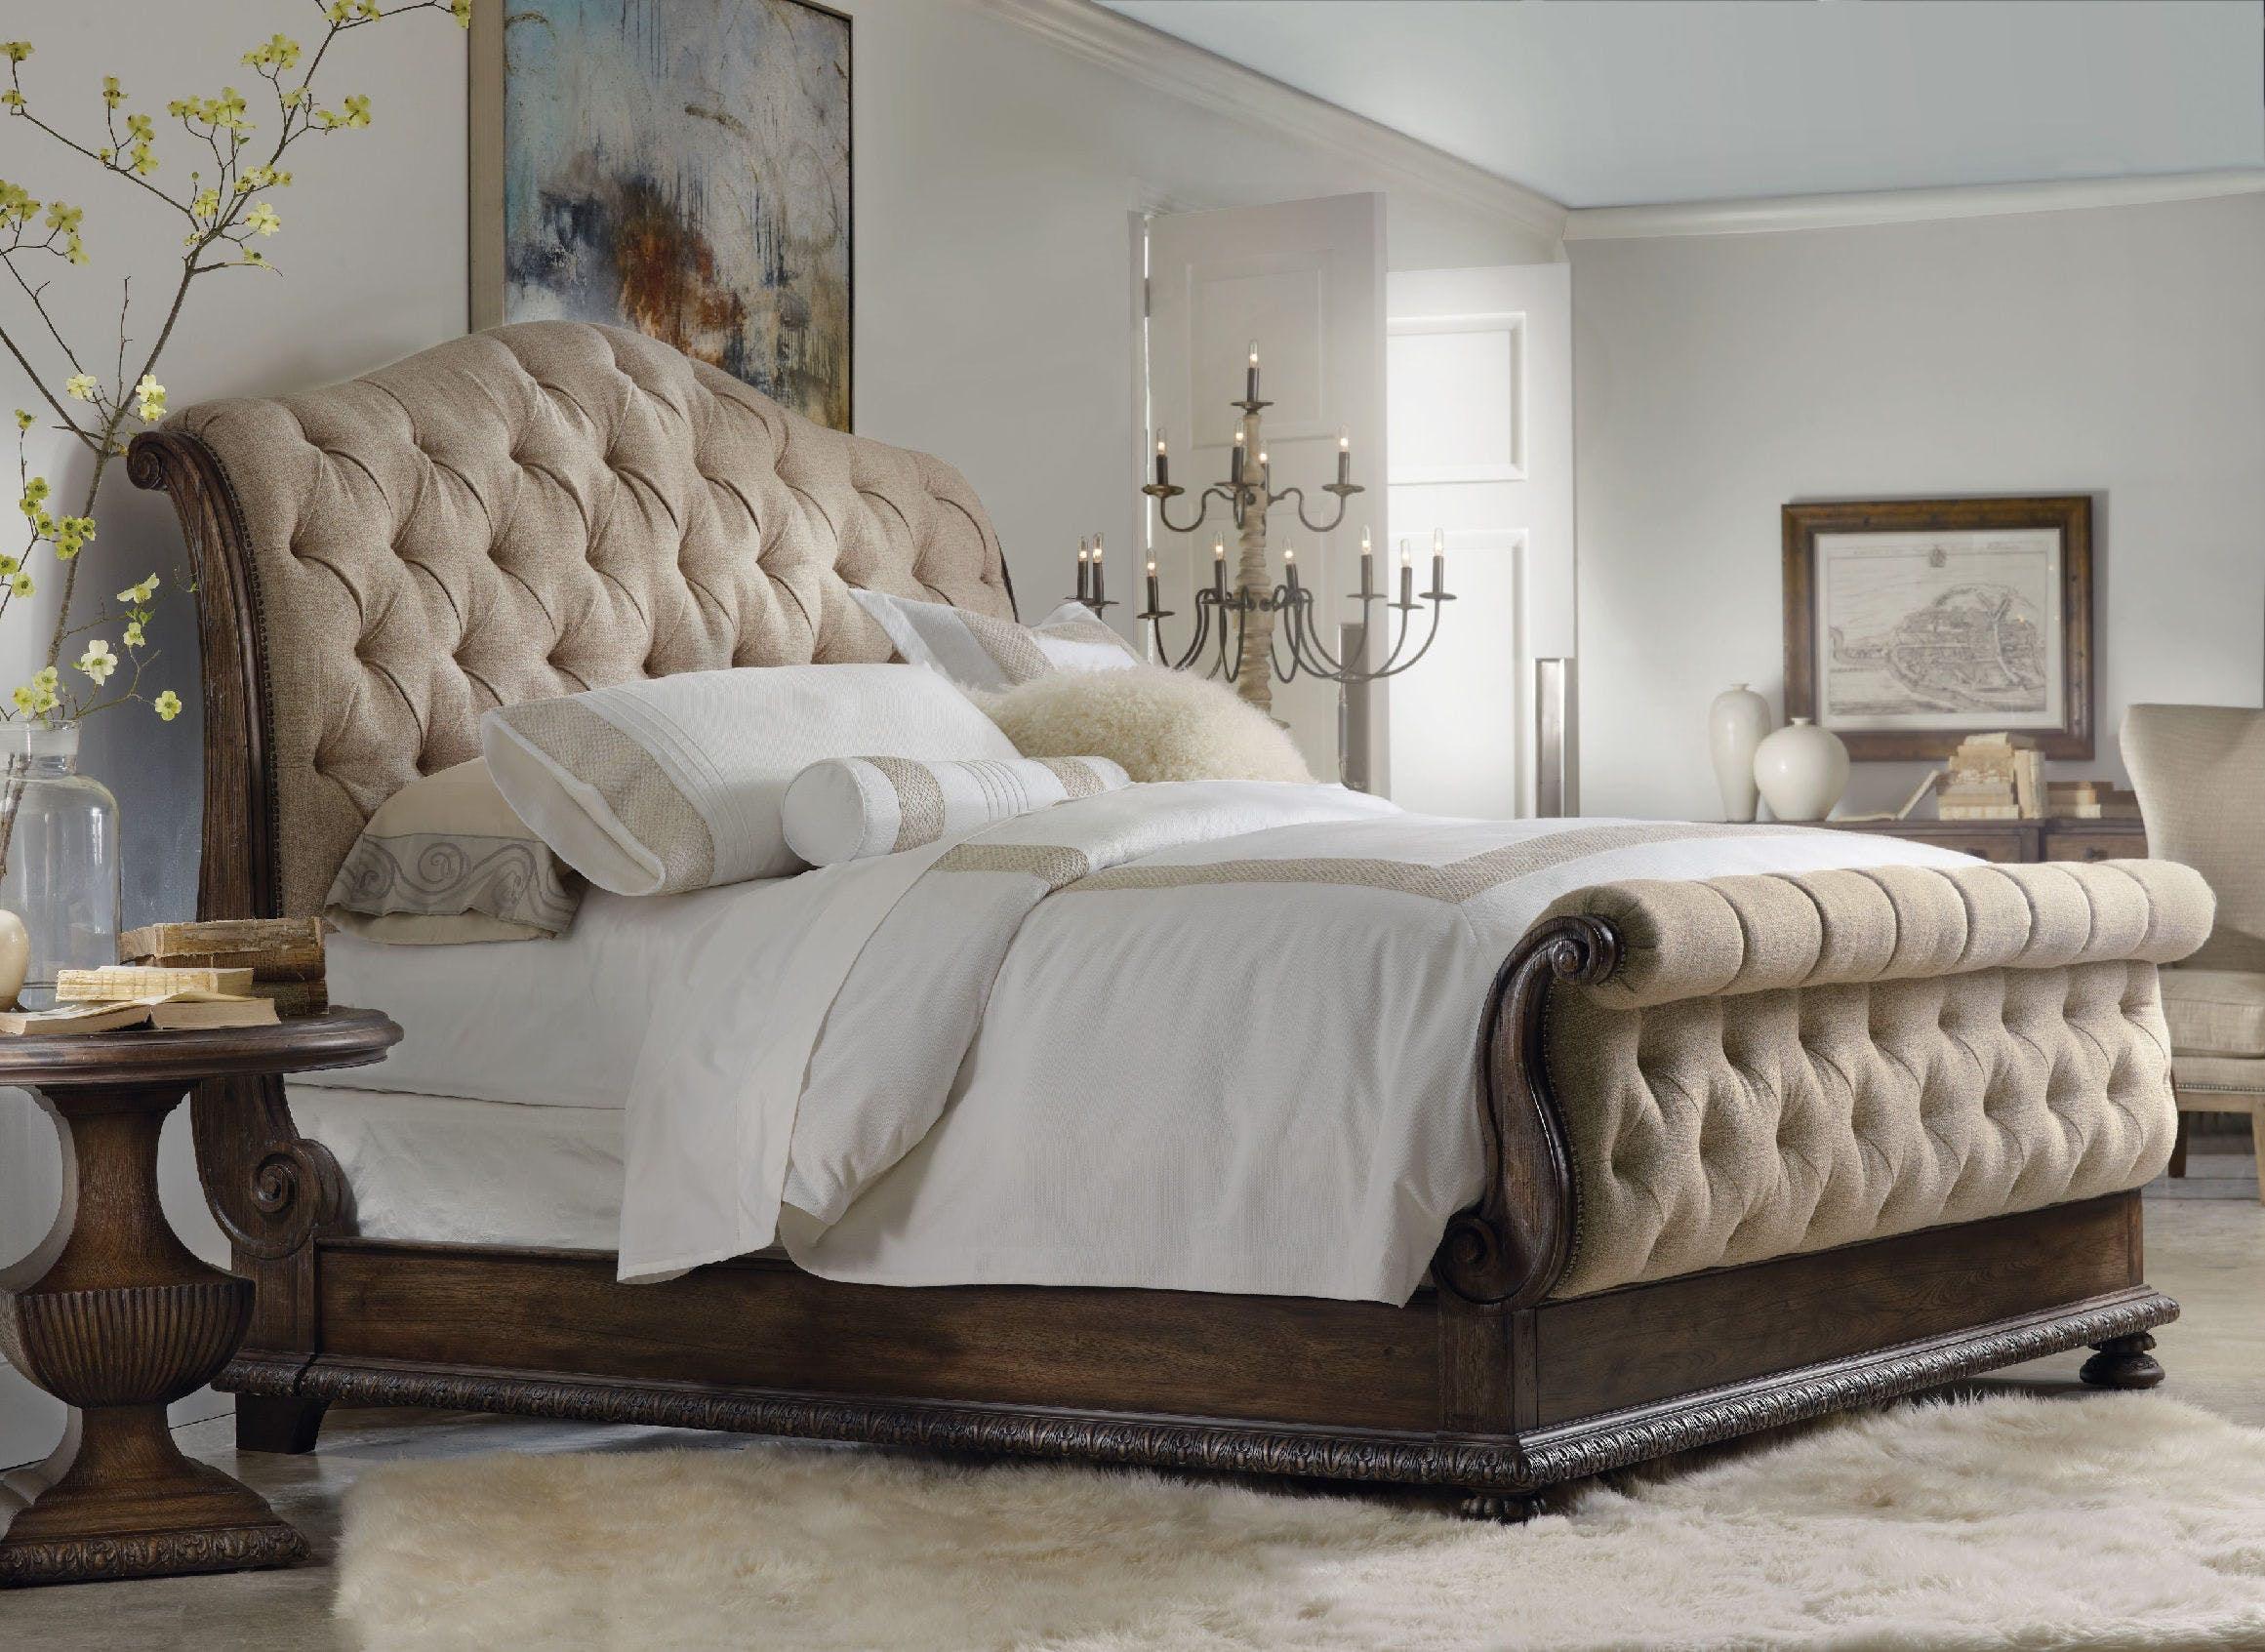 tufted bedroom furniture. Hooker Furniture Rhapsody Queen Tufted Bed 5070-90550 Bedroom O